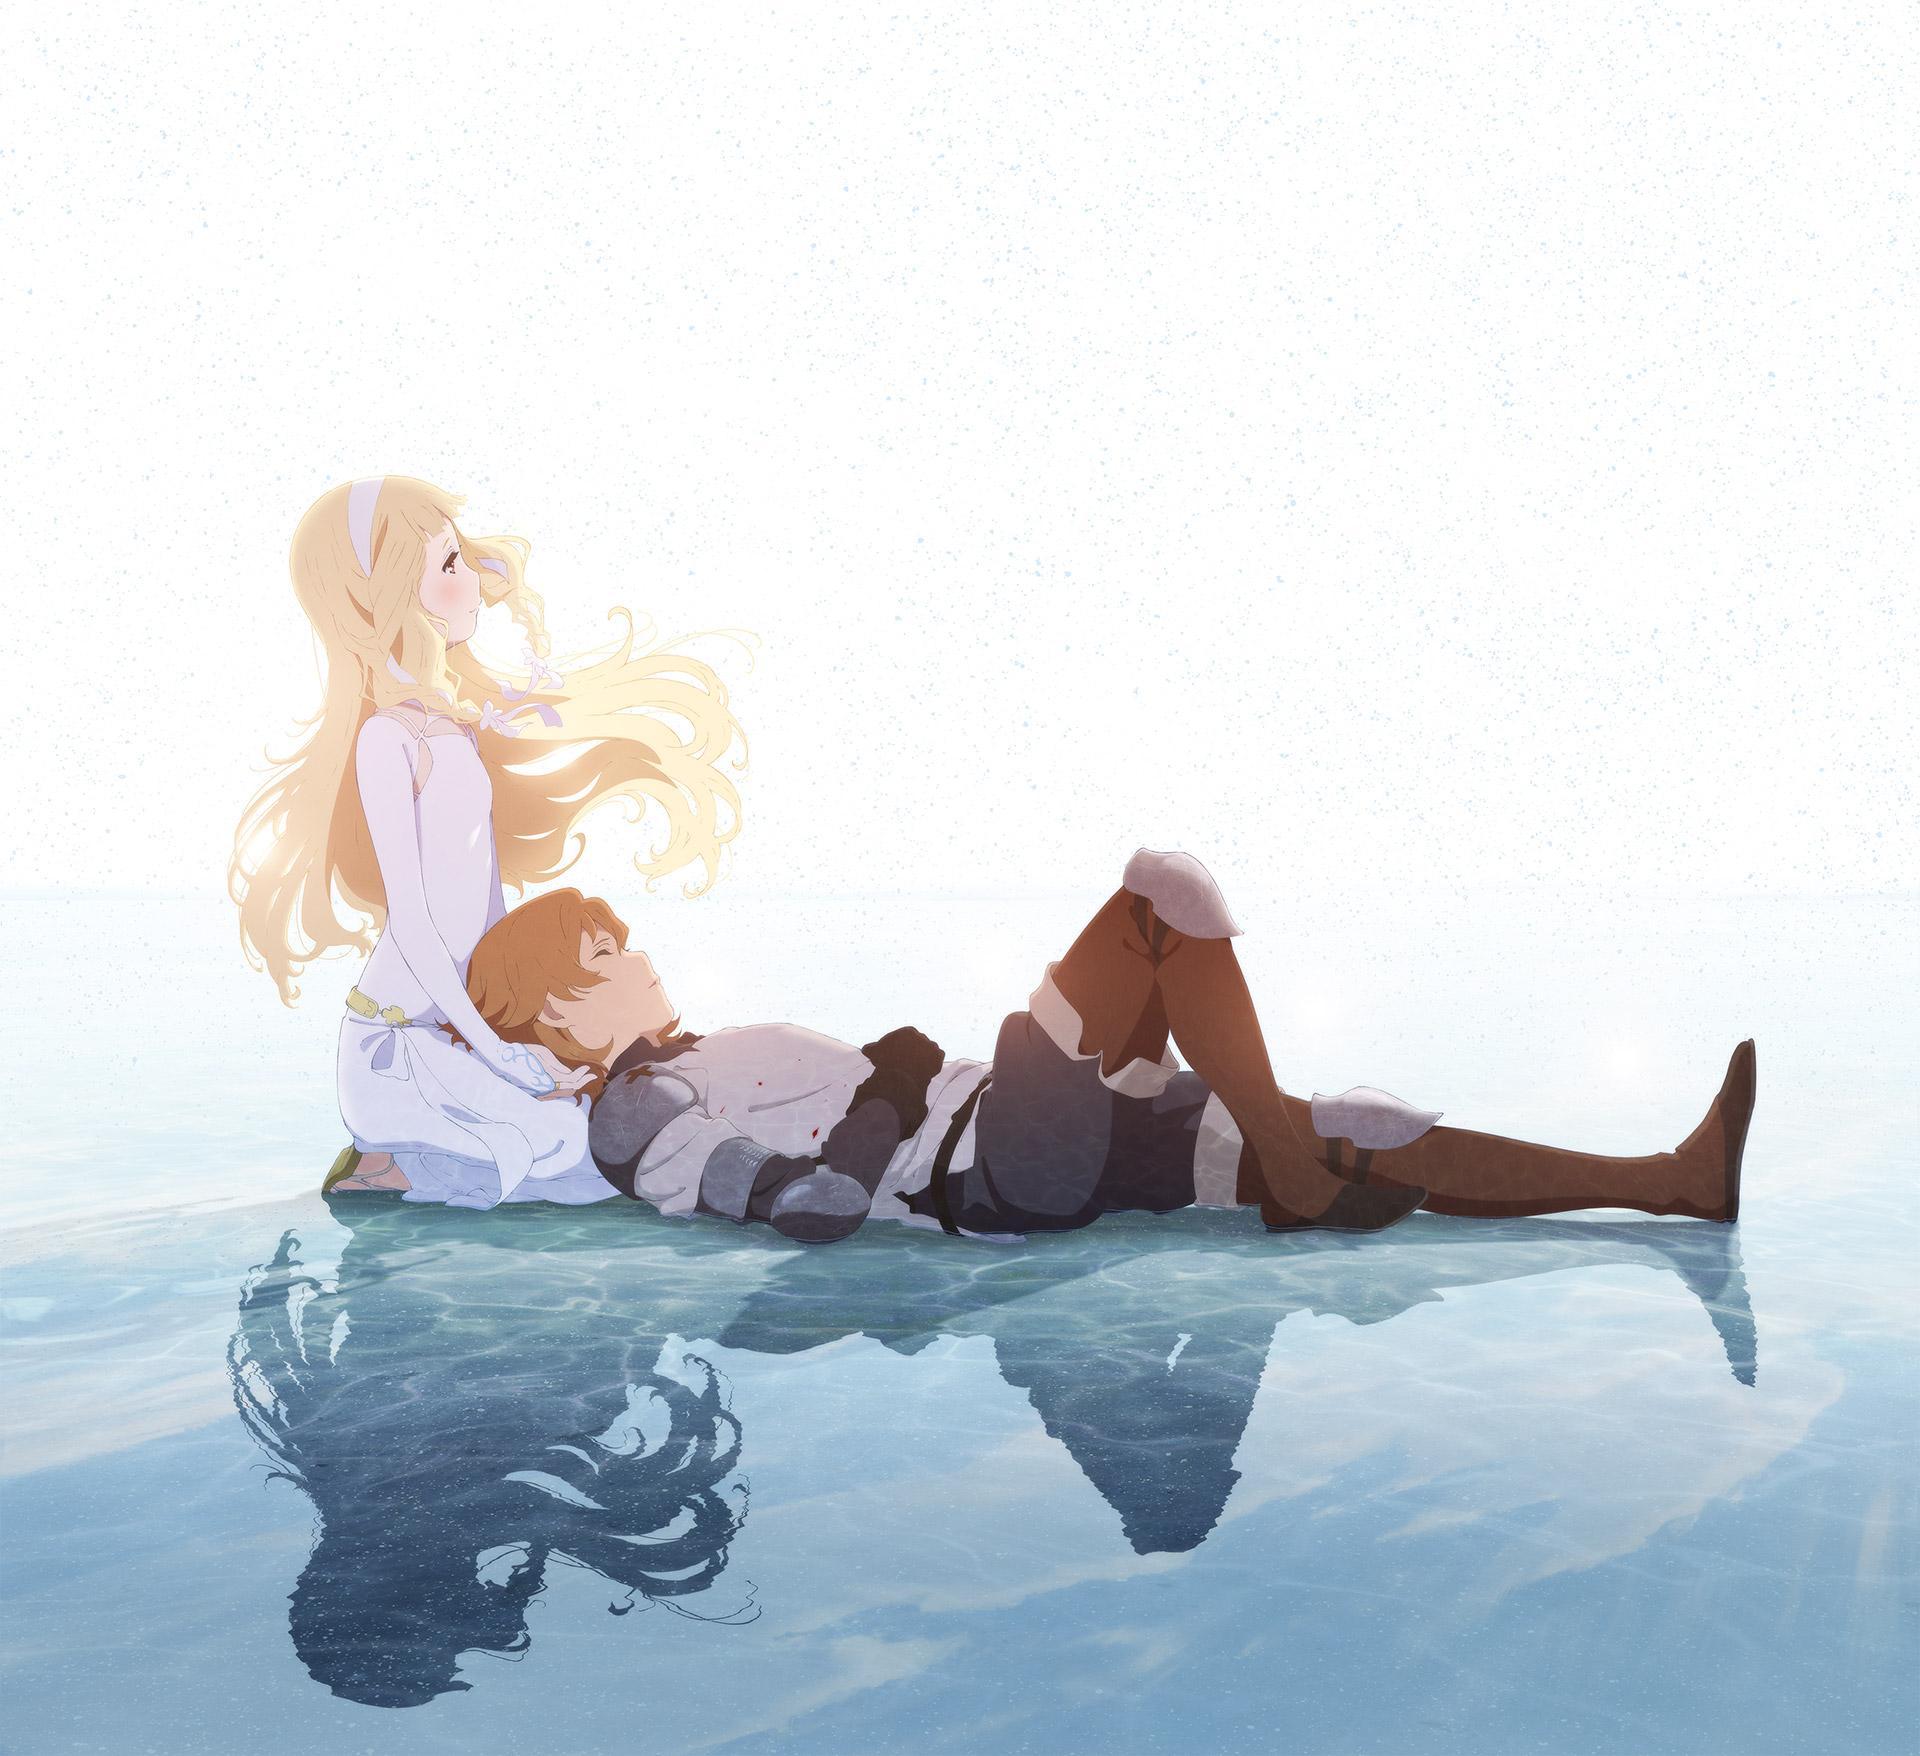 【1080P】【CHS】朝花夕誓 さよならの朝に約束の花をかざろう (2018)